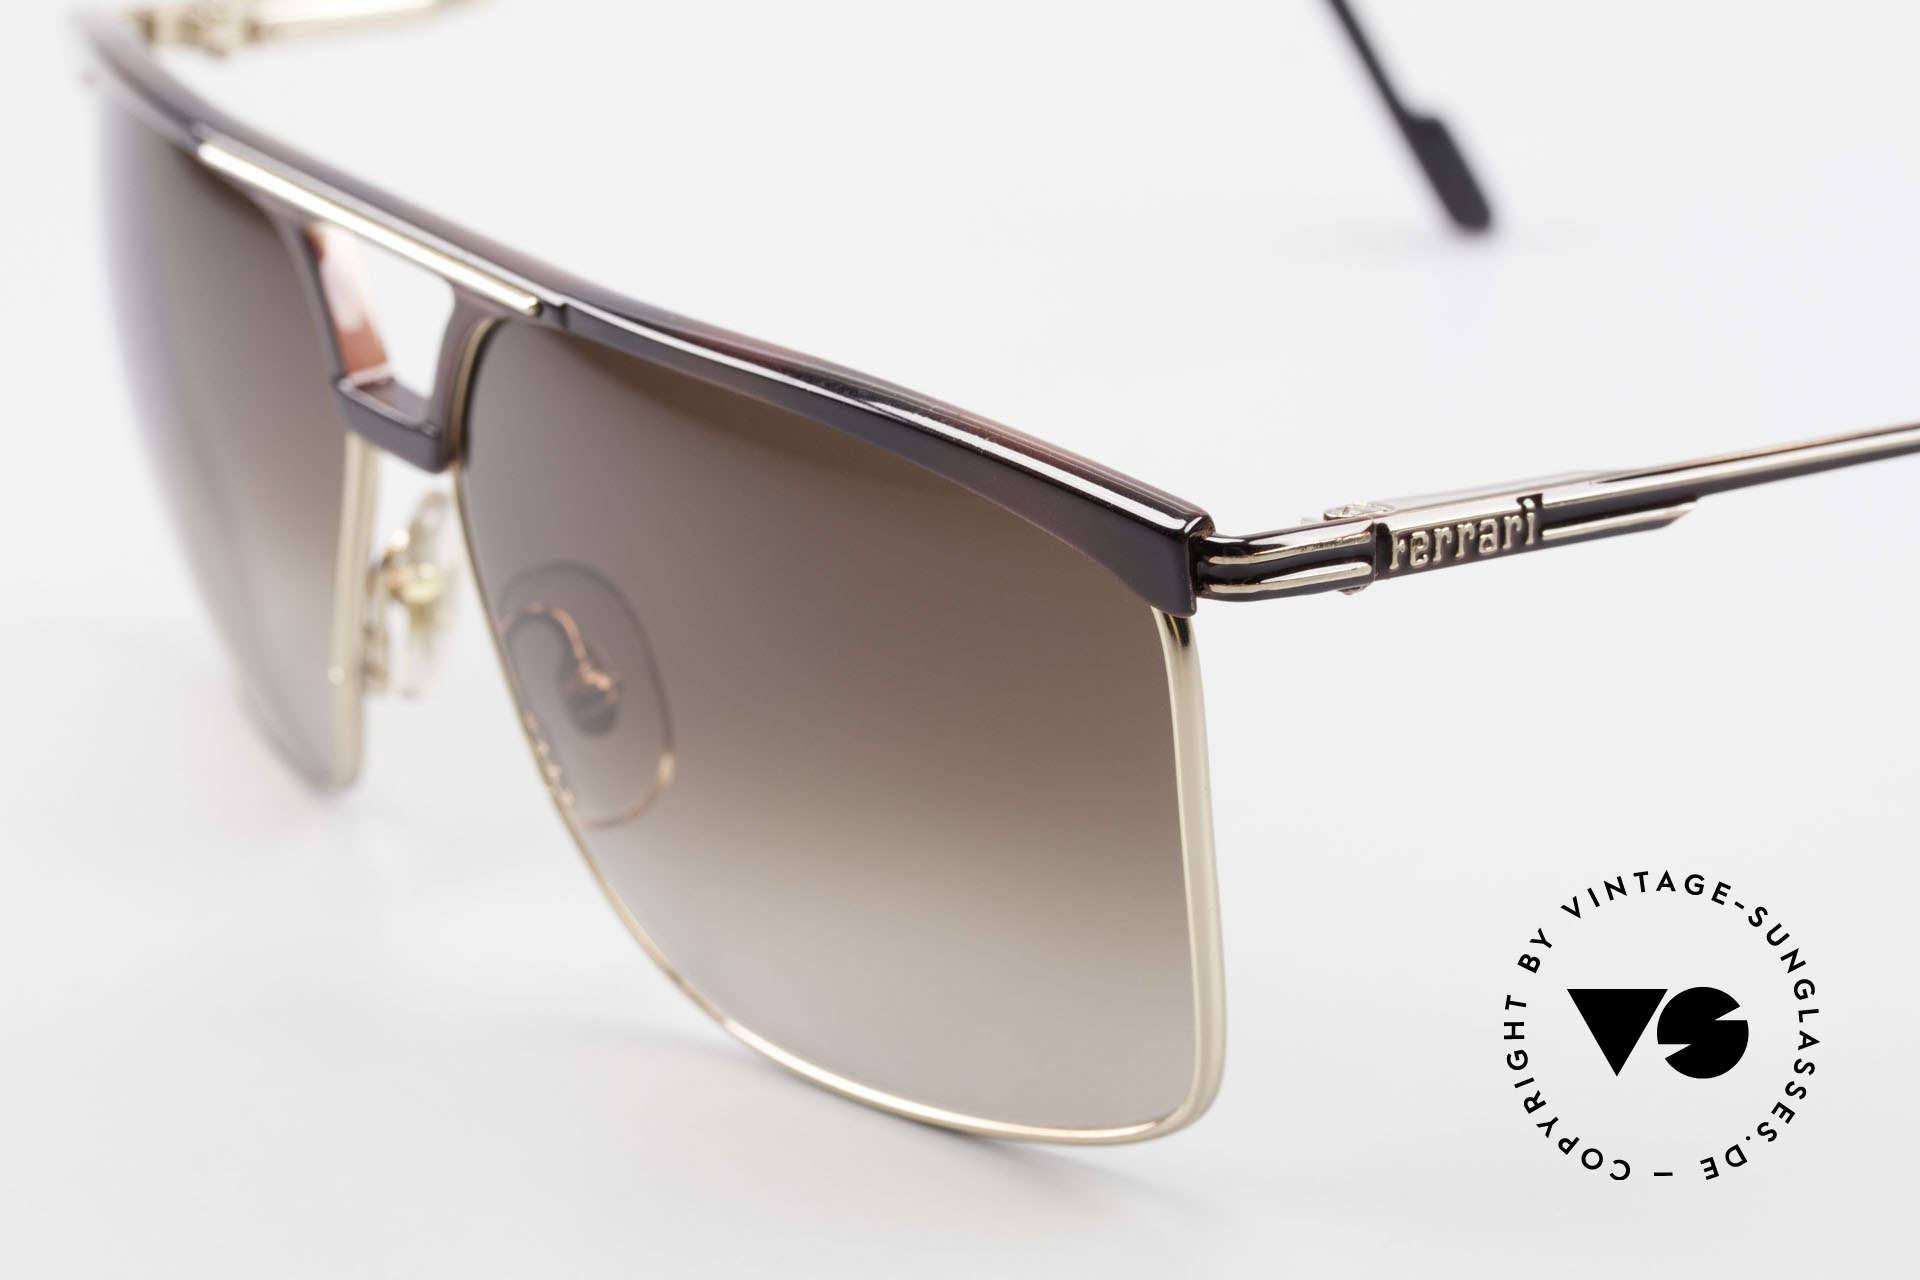 Ferrari F35 Formula 1 Sunglasses X-Large, never worn (like all our RARE vintage Ferrari shades), Made for Men